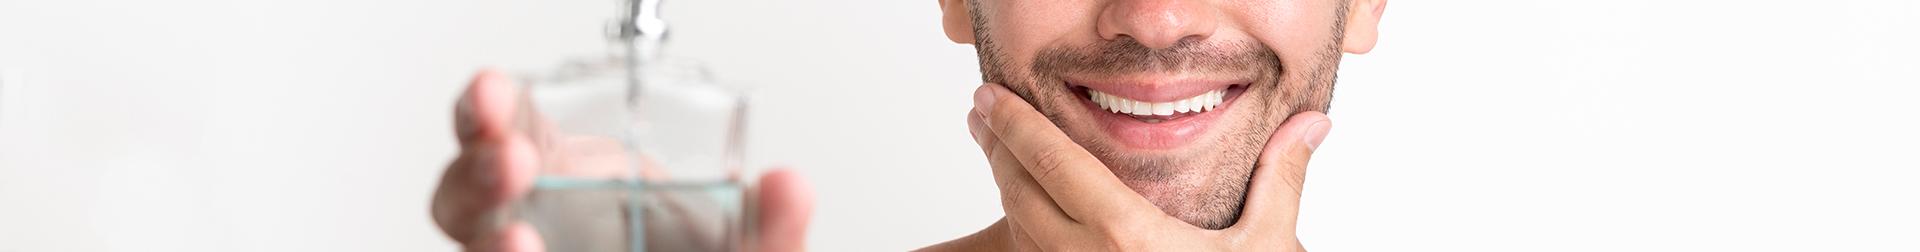 After Shaves | After Shaves - Buy After Shave Lotions, After Shaves Creams  | Aromacraze.com